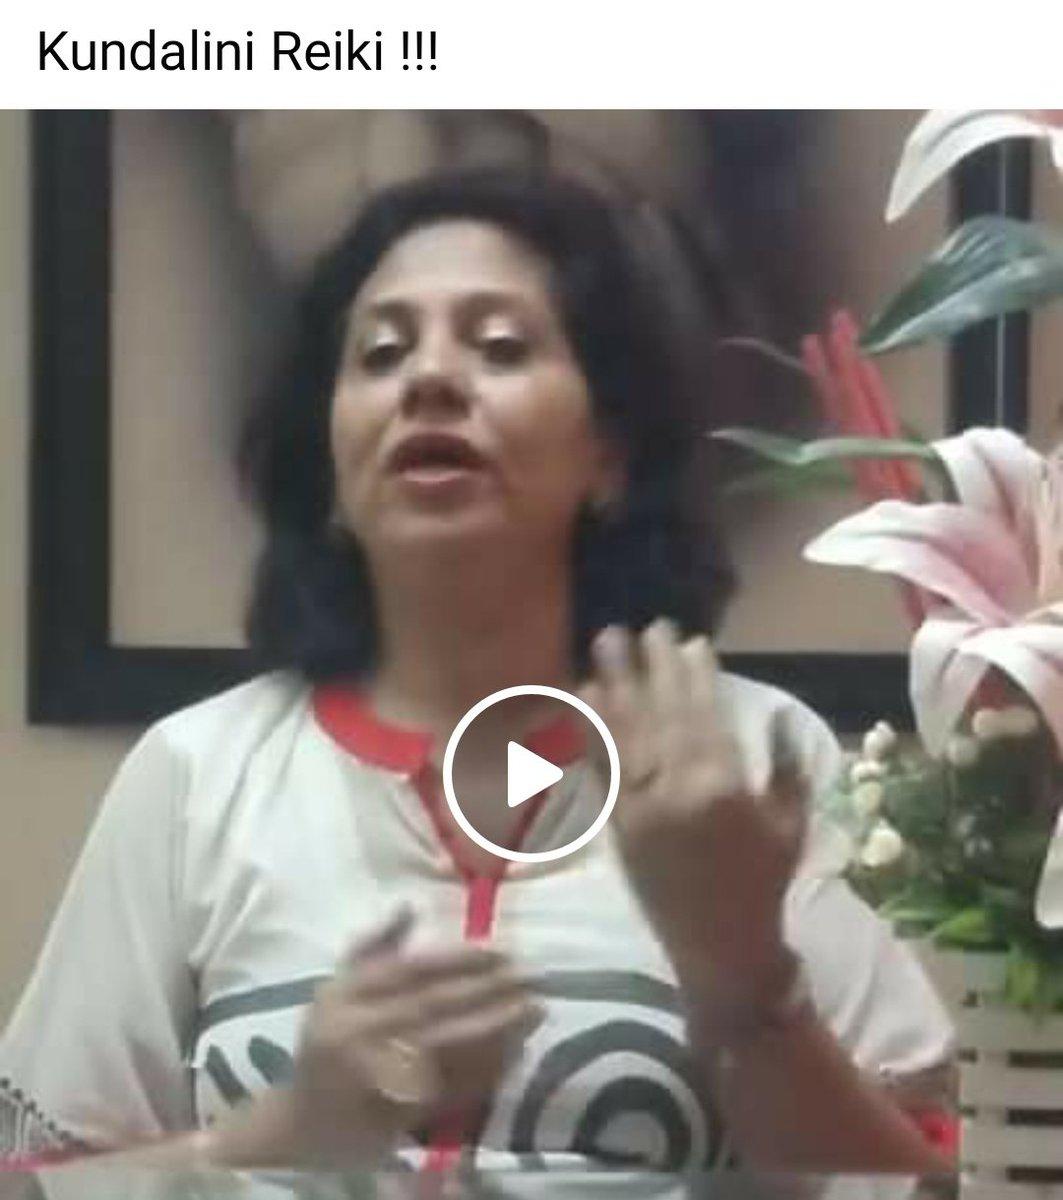 Kundalini Reiki  https://m.facebook.com/story.php?story_fbid=840752339685700&id=263067027454237…  #nirvanahealingcentre #sujok #spiritualhealing #healing #healingcrystals #lamafera #accessfacilitator #reikigrandmaster #reikimasterteacher #aurahealing #chakrahealing #chakrahealingbracelets #energyhealing #reikilearning #reikiholyfirepic.twitter.com/c5cqu5y8ZR